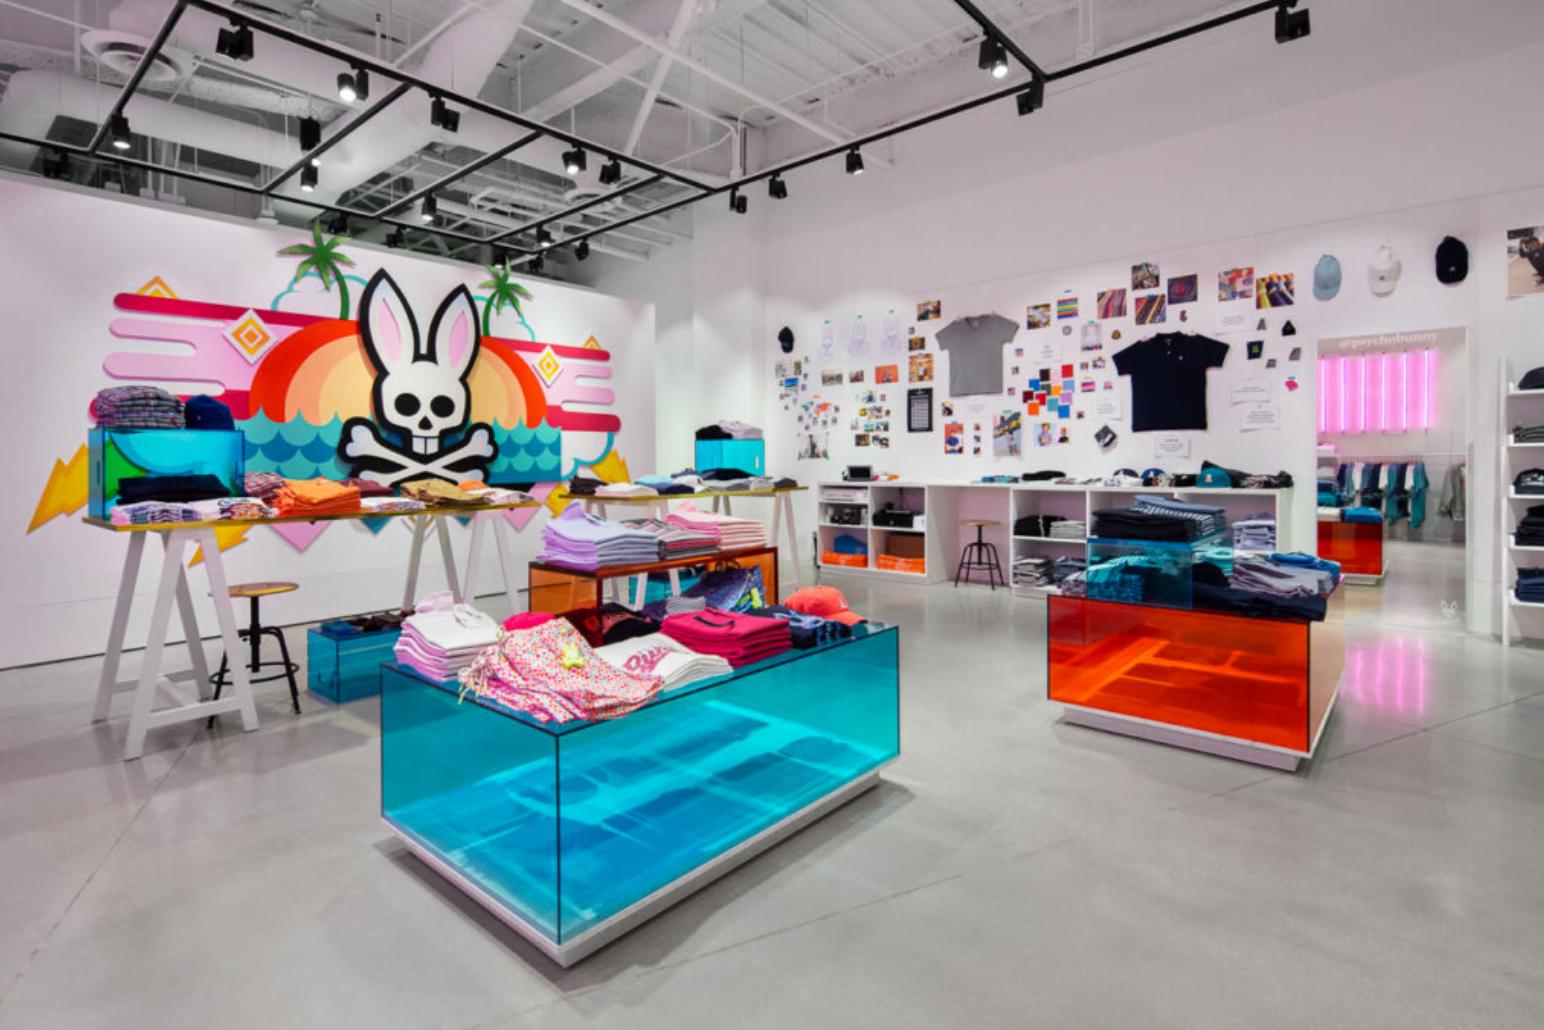 Popup Psycho Bunny store in Miami. Photo: Psycho Bunny